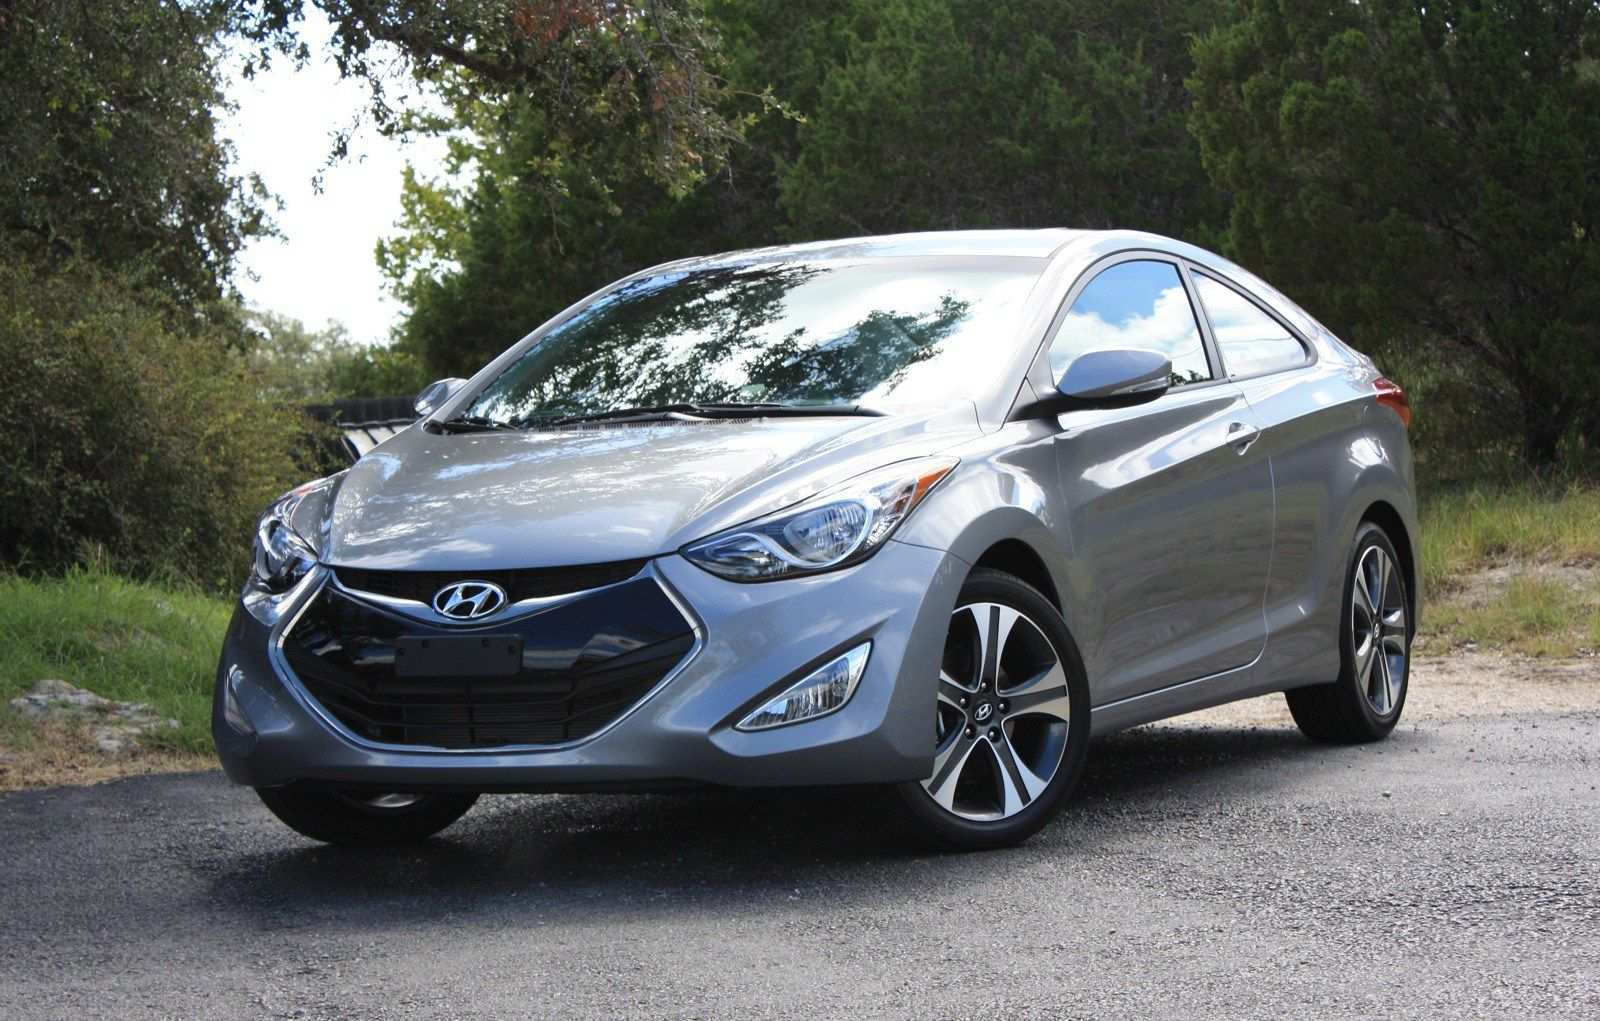 18 Concept of Hyundai Cars 2020 Style by Hyundai Cars 2020